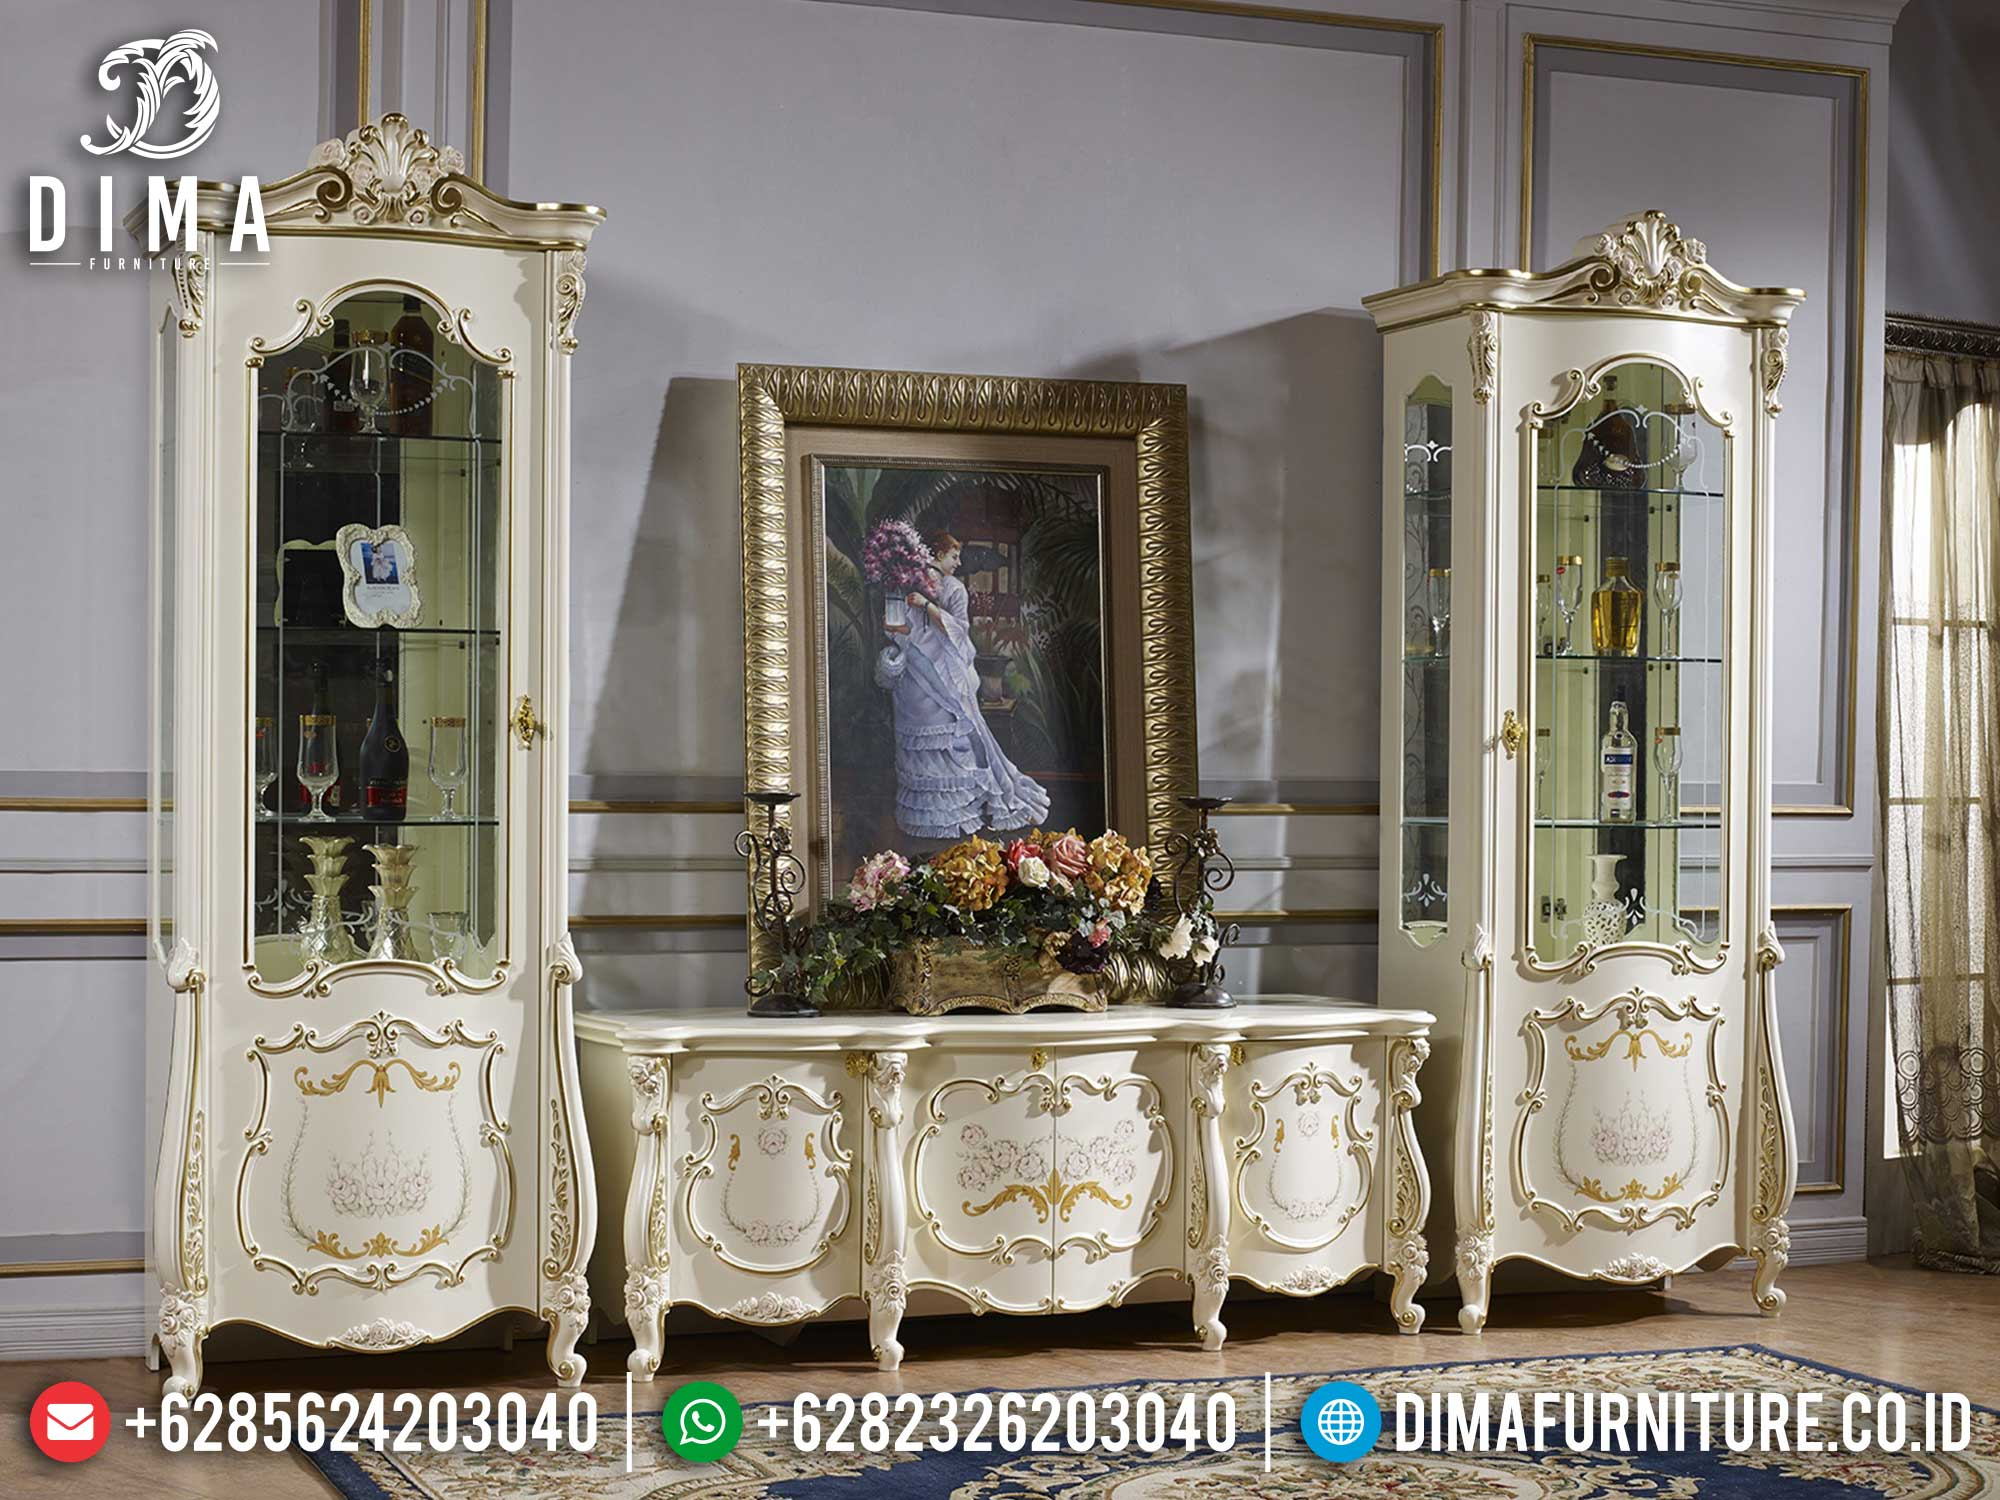 Harga Bufet TV Mewah Classic Luxury Best Seller 2021 BT-0956